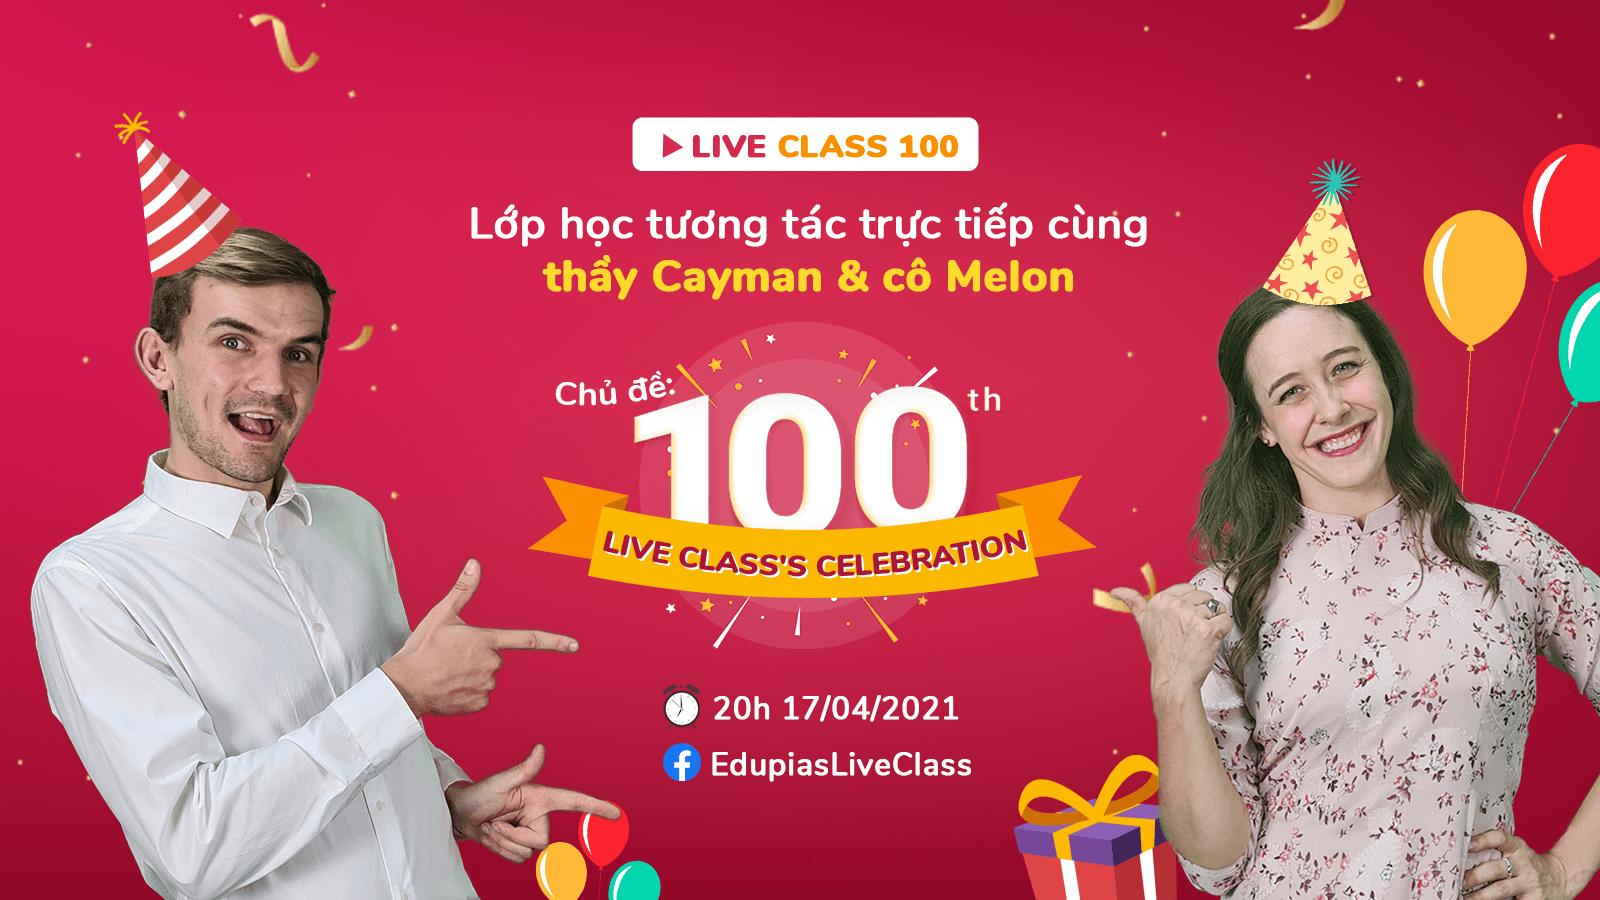 Live class tuần 100 - Chủ đề: 100th Live class's celebration